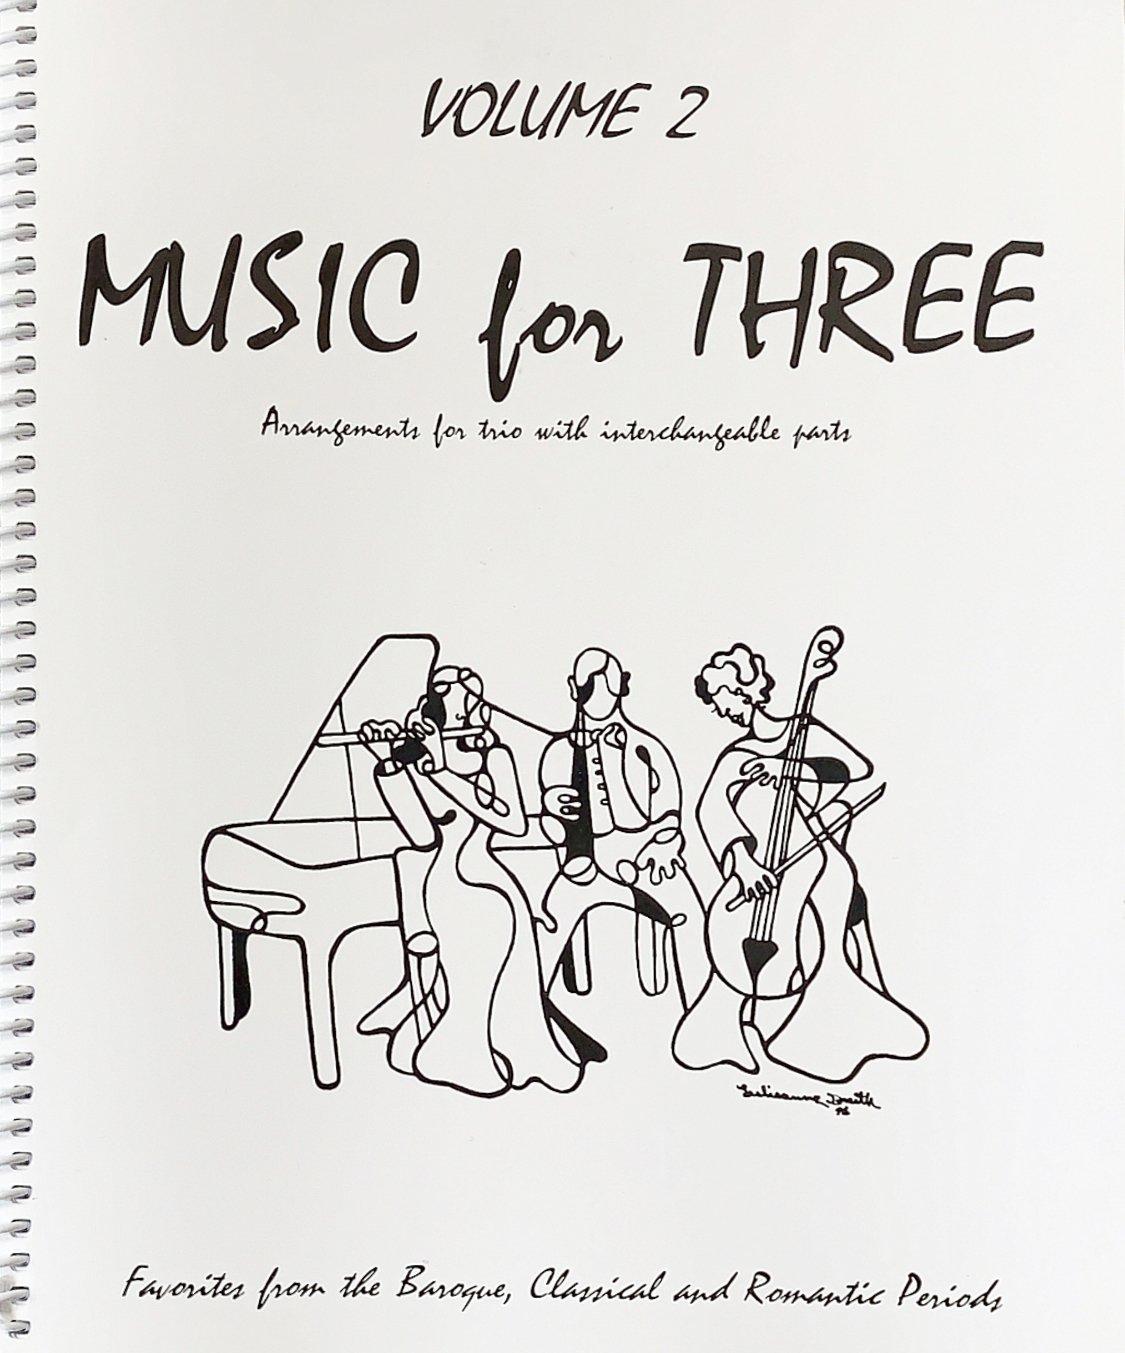 Music for Three Vol 2 Pt 1 Violin - Trio - Kelley - Last Resort